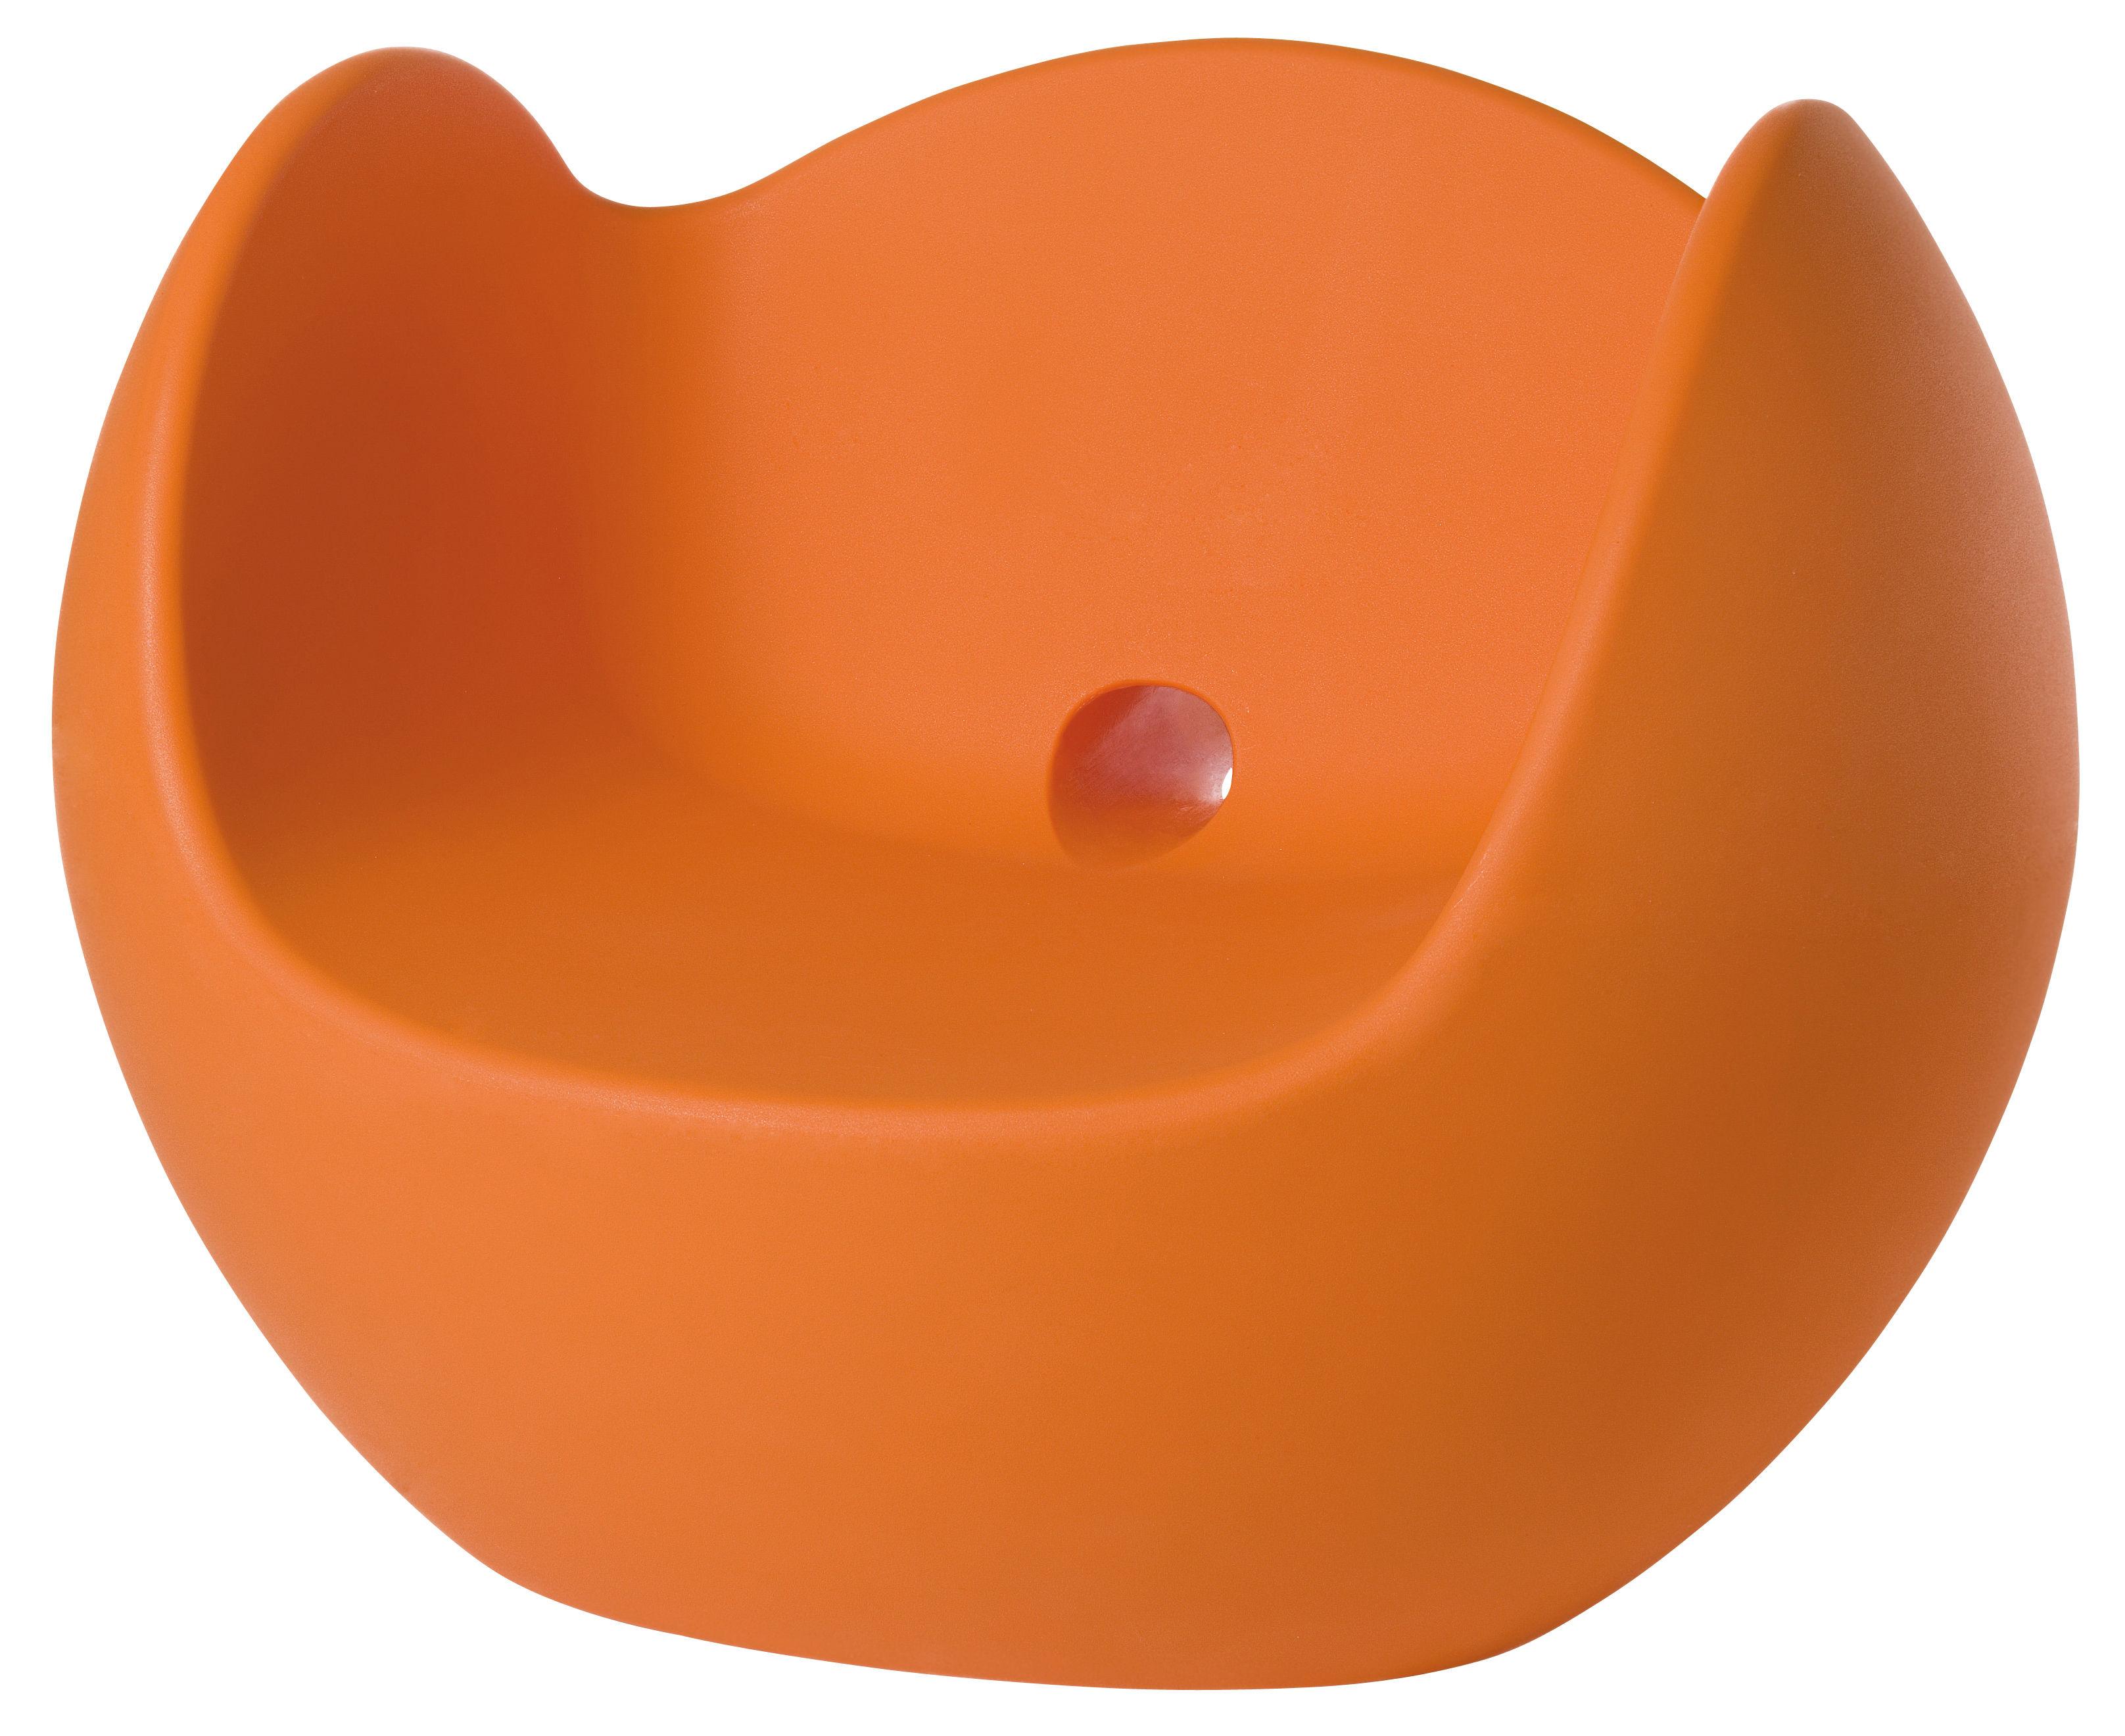 Arredamento - Mobili Ados  - Rocking chair Blos di Slide - Arancione - Polietilene